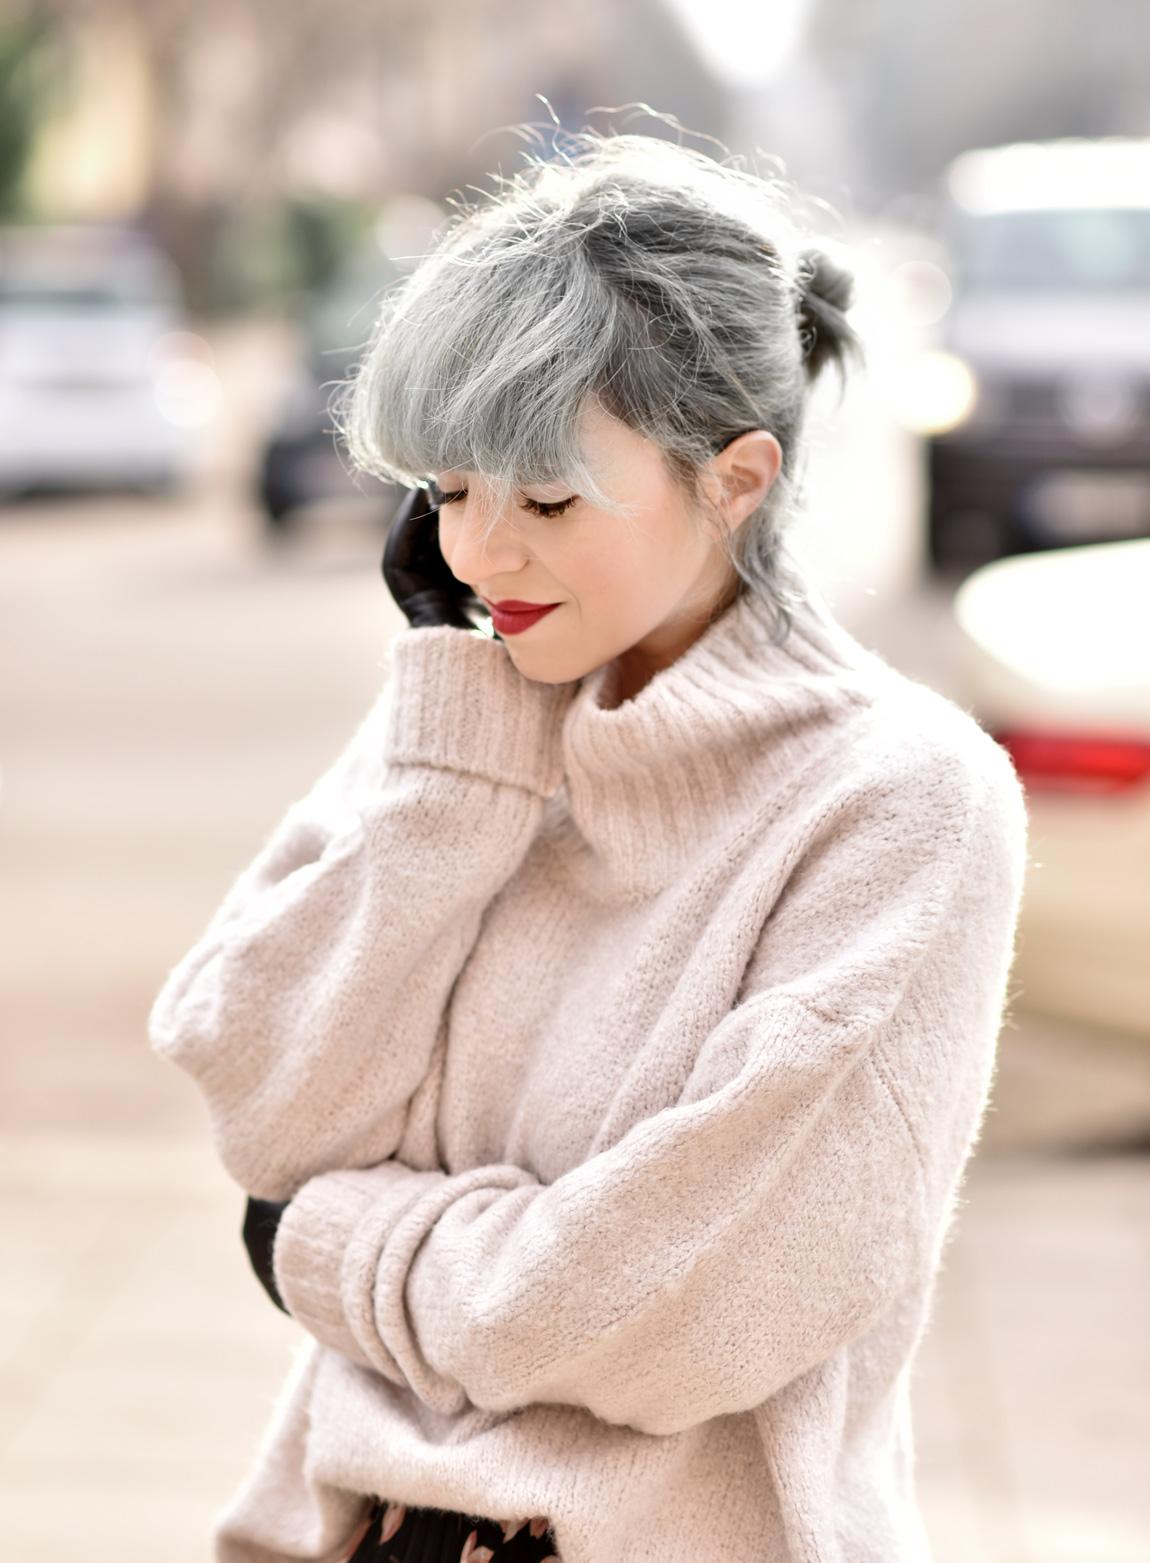 blumen, rock, pullover, winter, fashionblogger, modeblogger, muenchen, silverhair, trend, inspiration, midi, boots